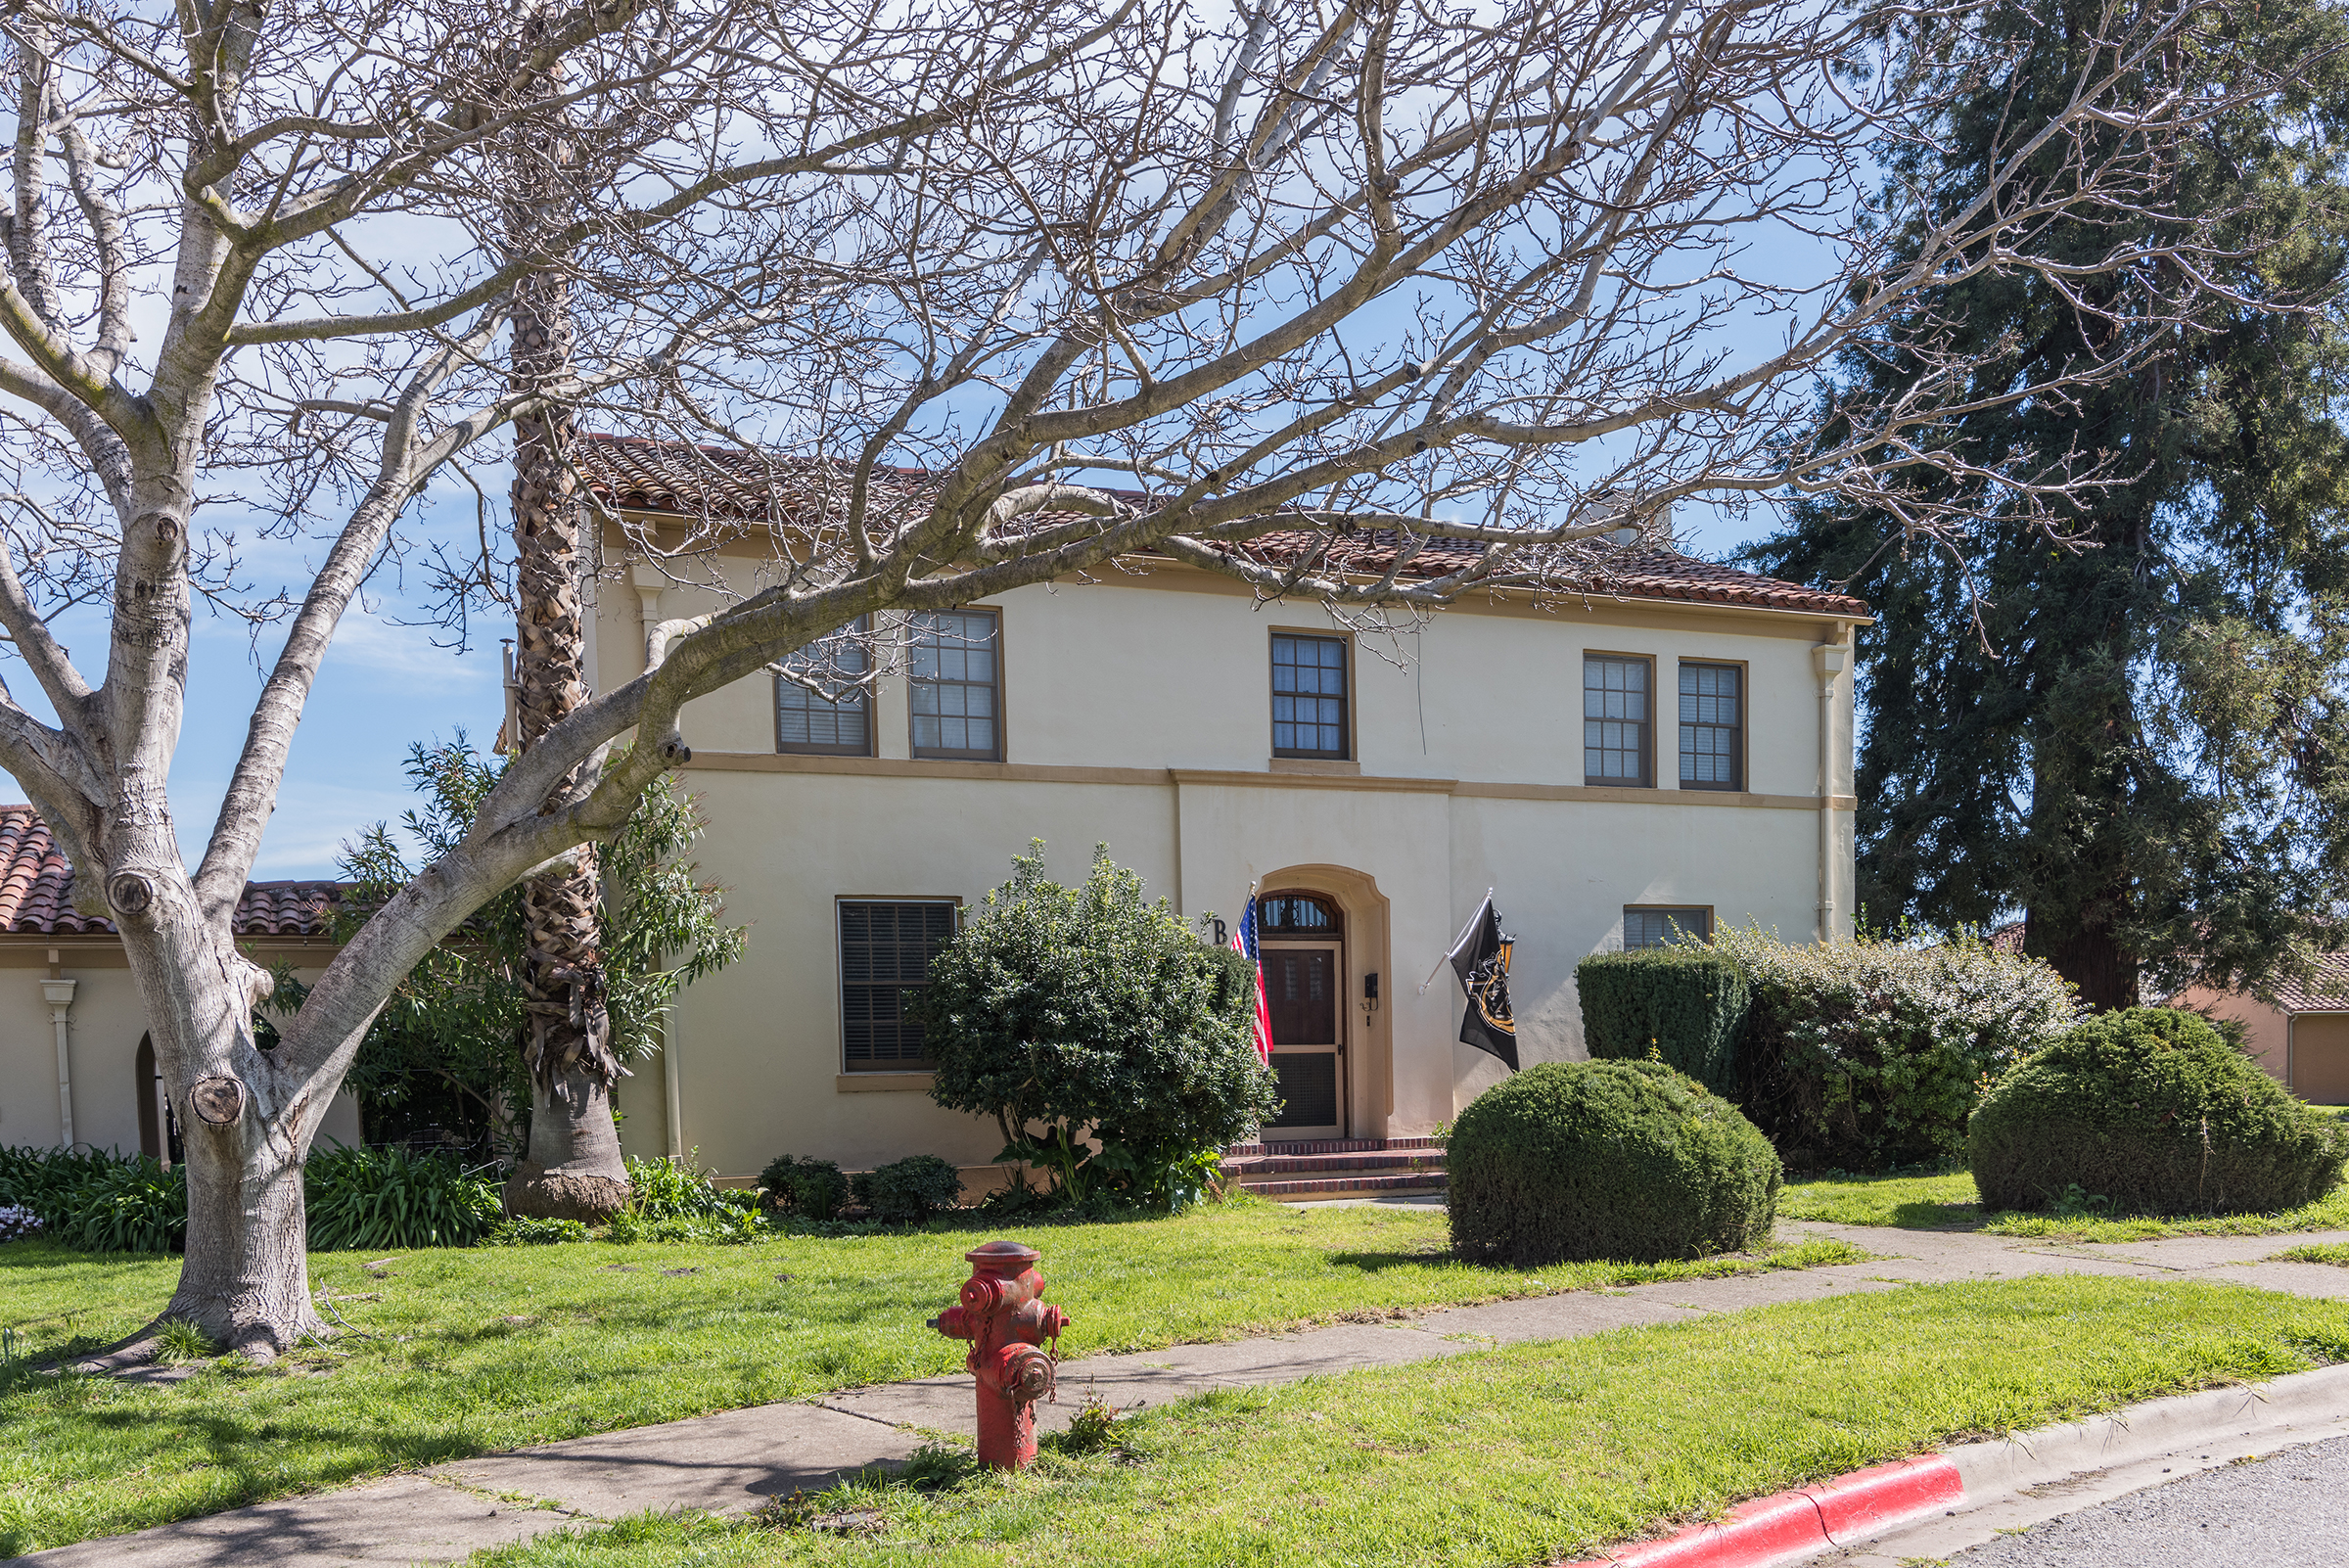 Single-Family Rental Homes Yards